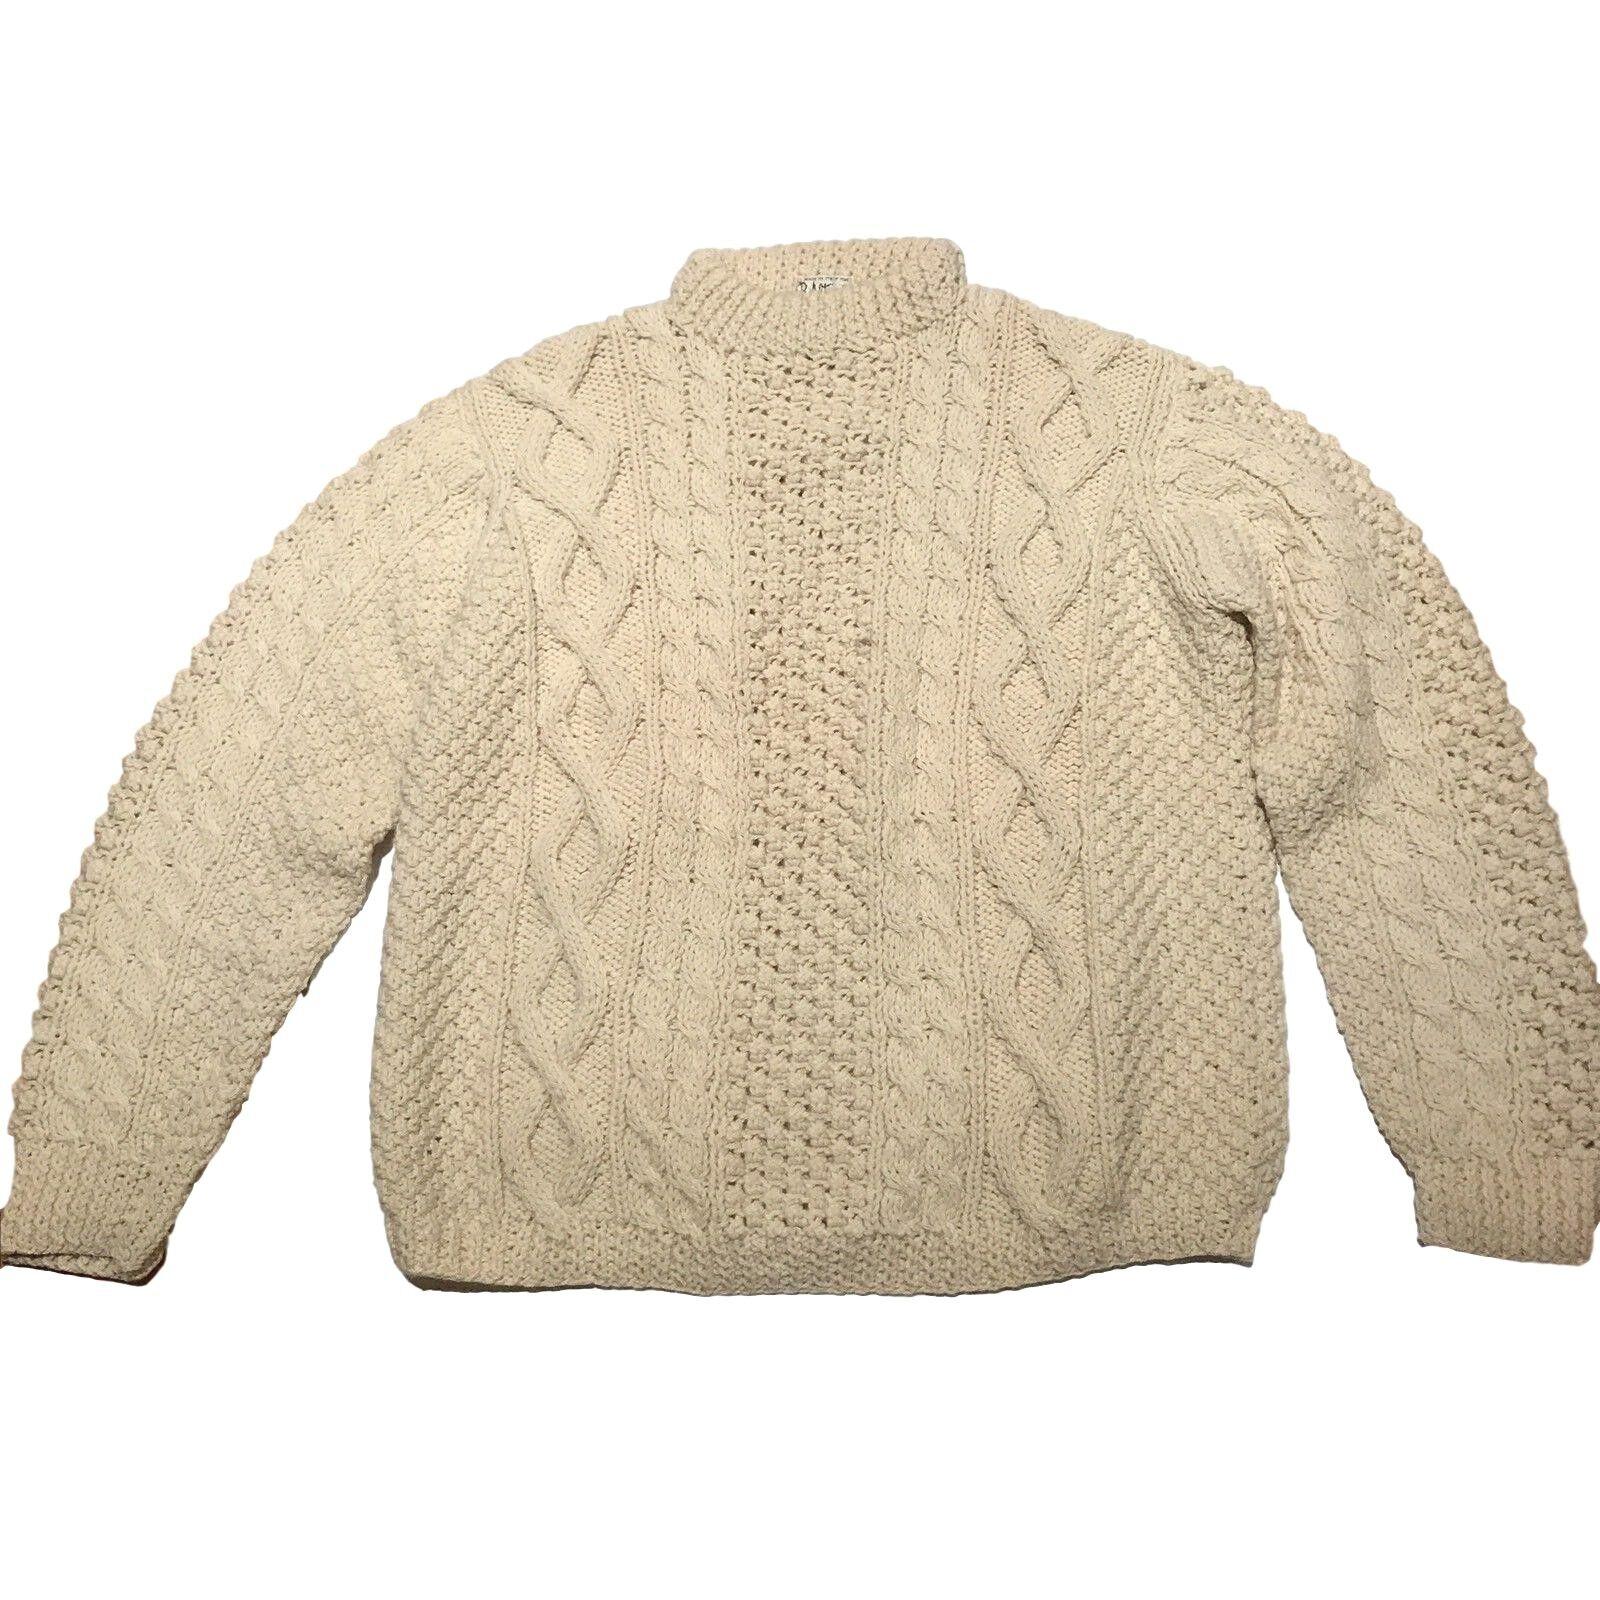 Vintage Mens B. Altman Fisherman Sweater Größe XL 90s Cream Virgin Wool